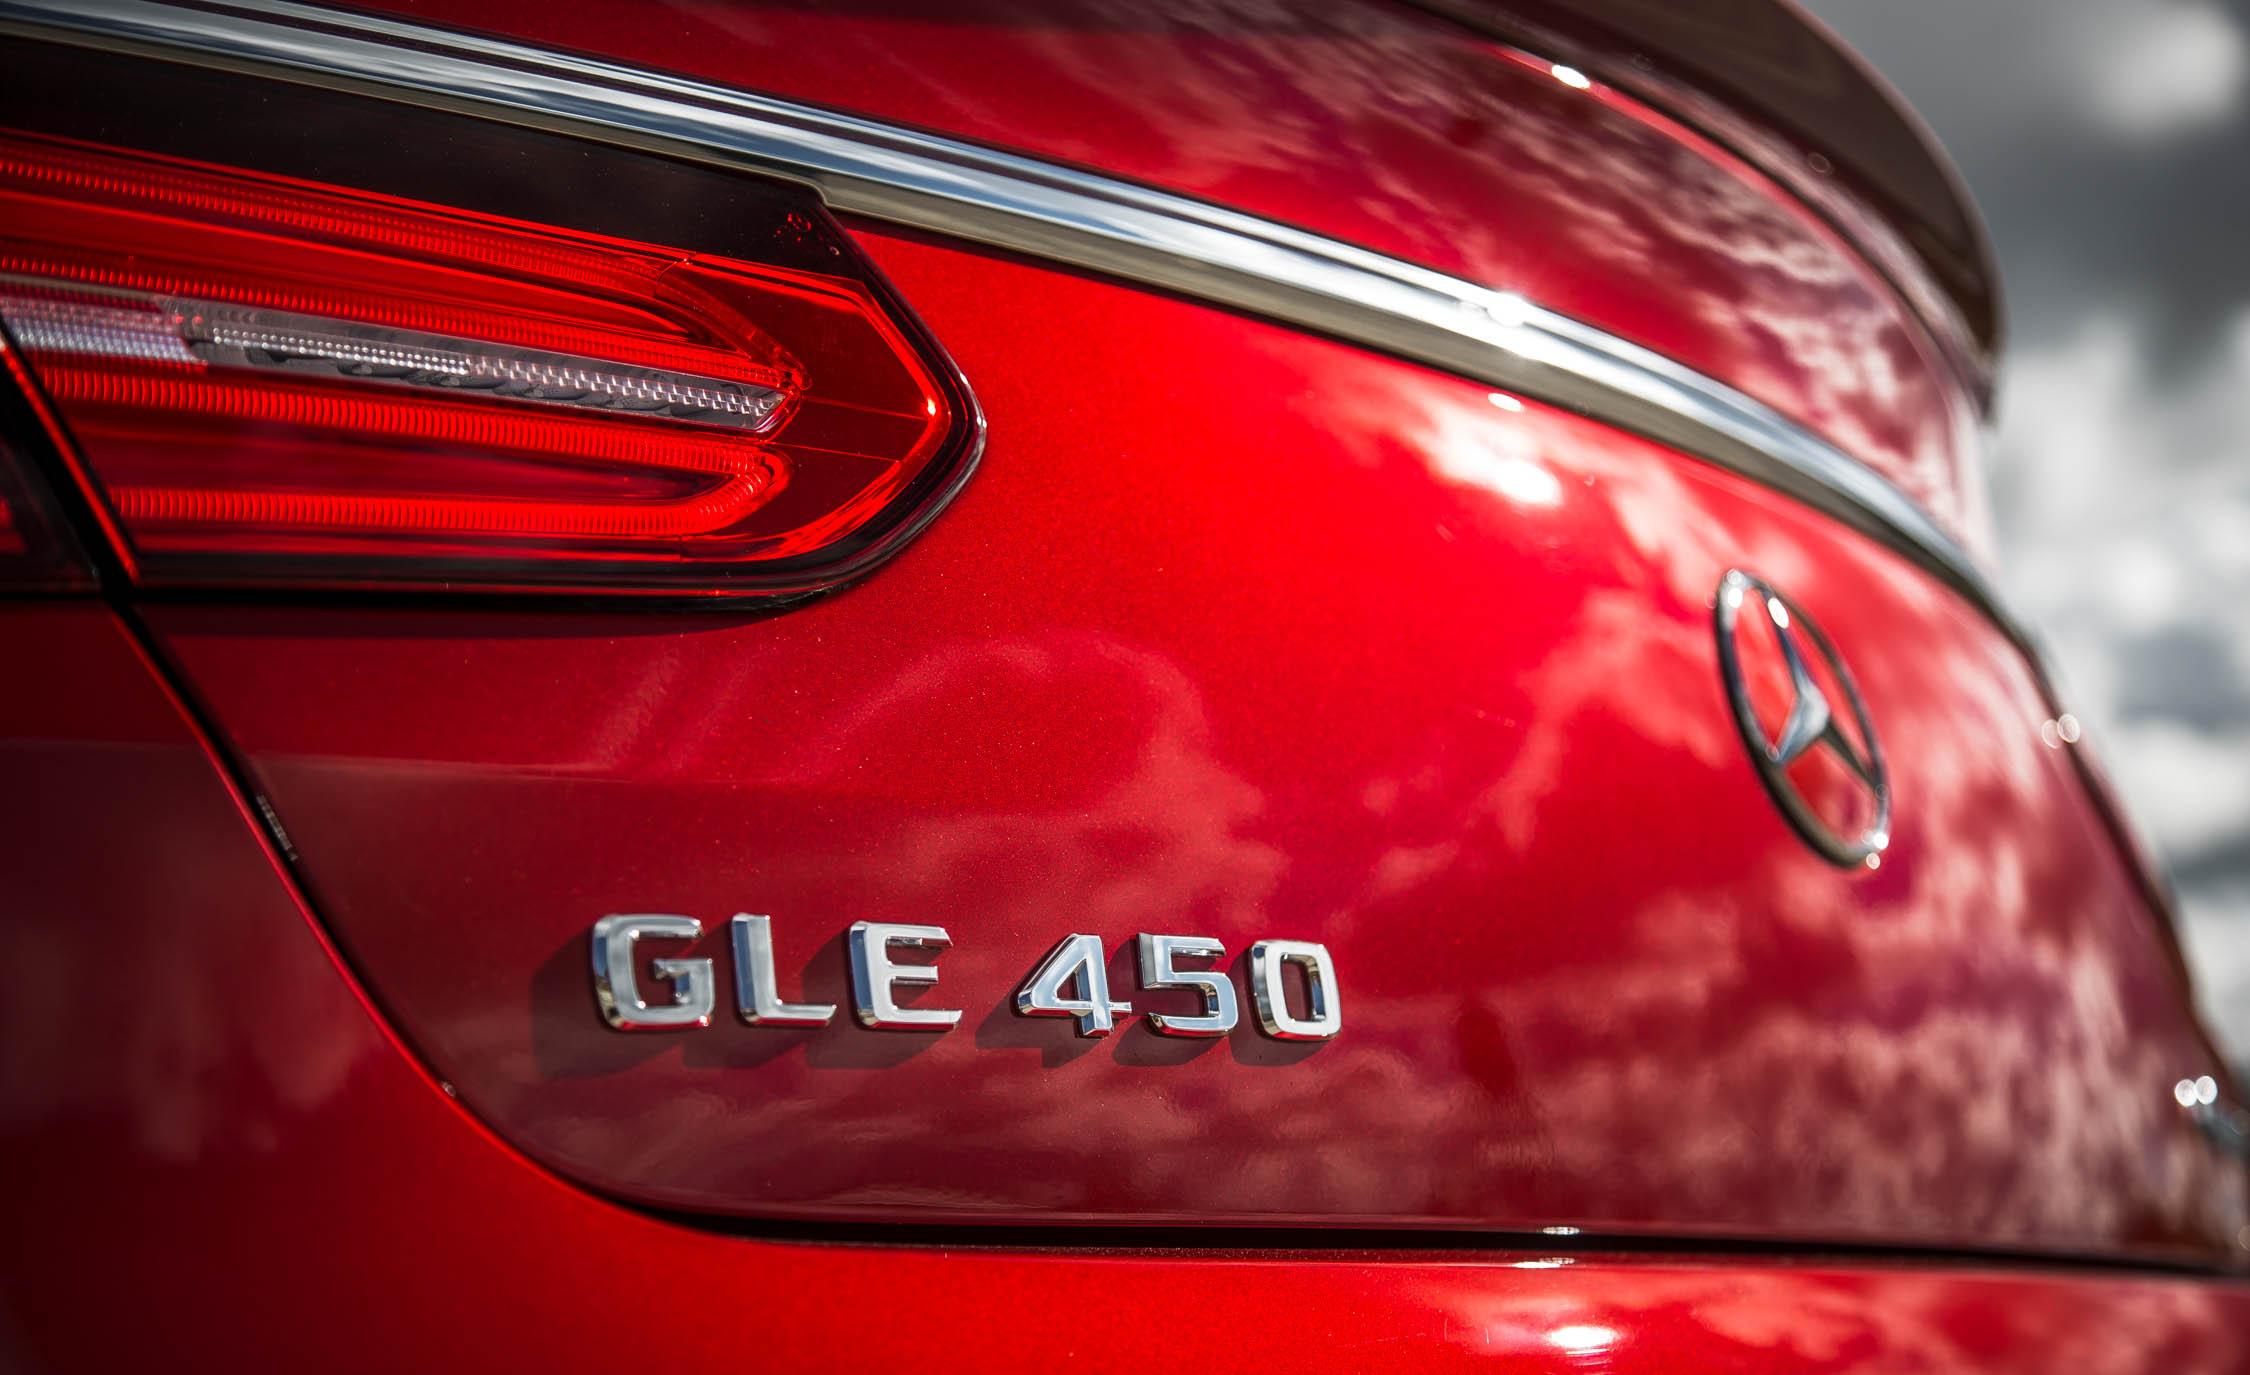 2016 Mercedes-Benz GLE450 AMG Coupe Exterior Rear Emblem